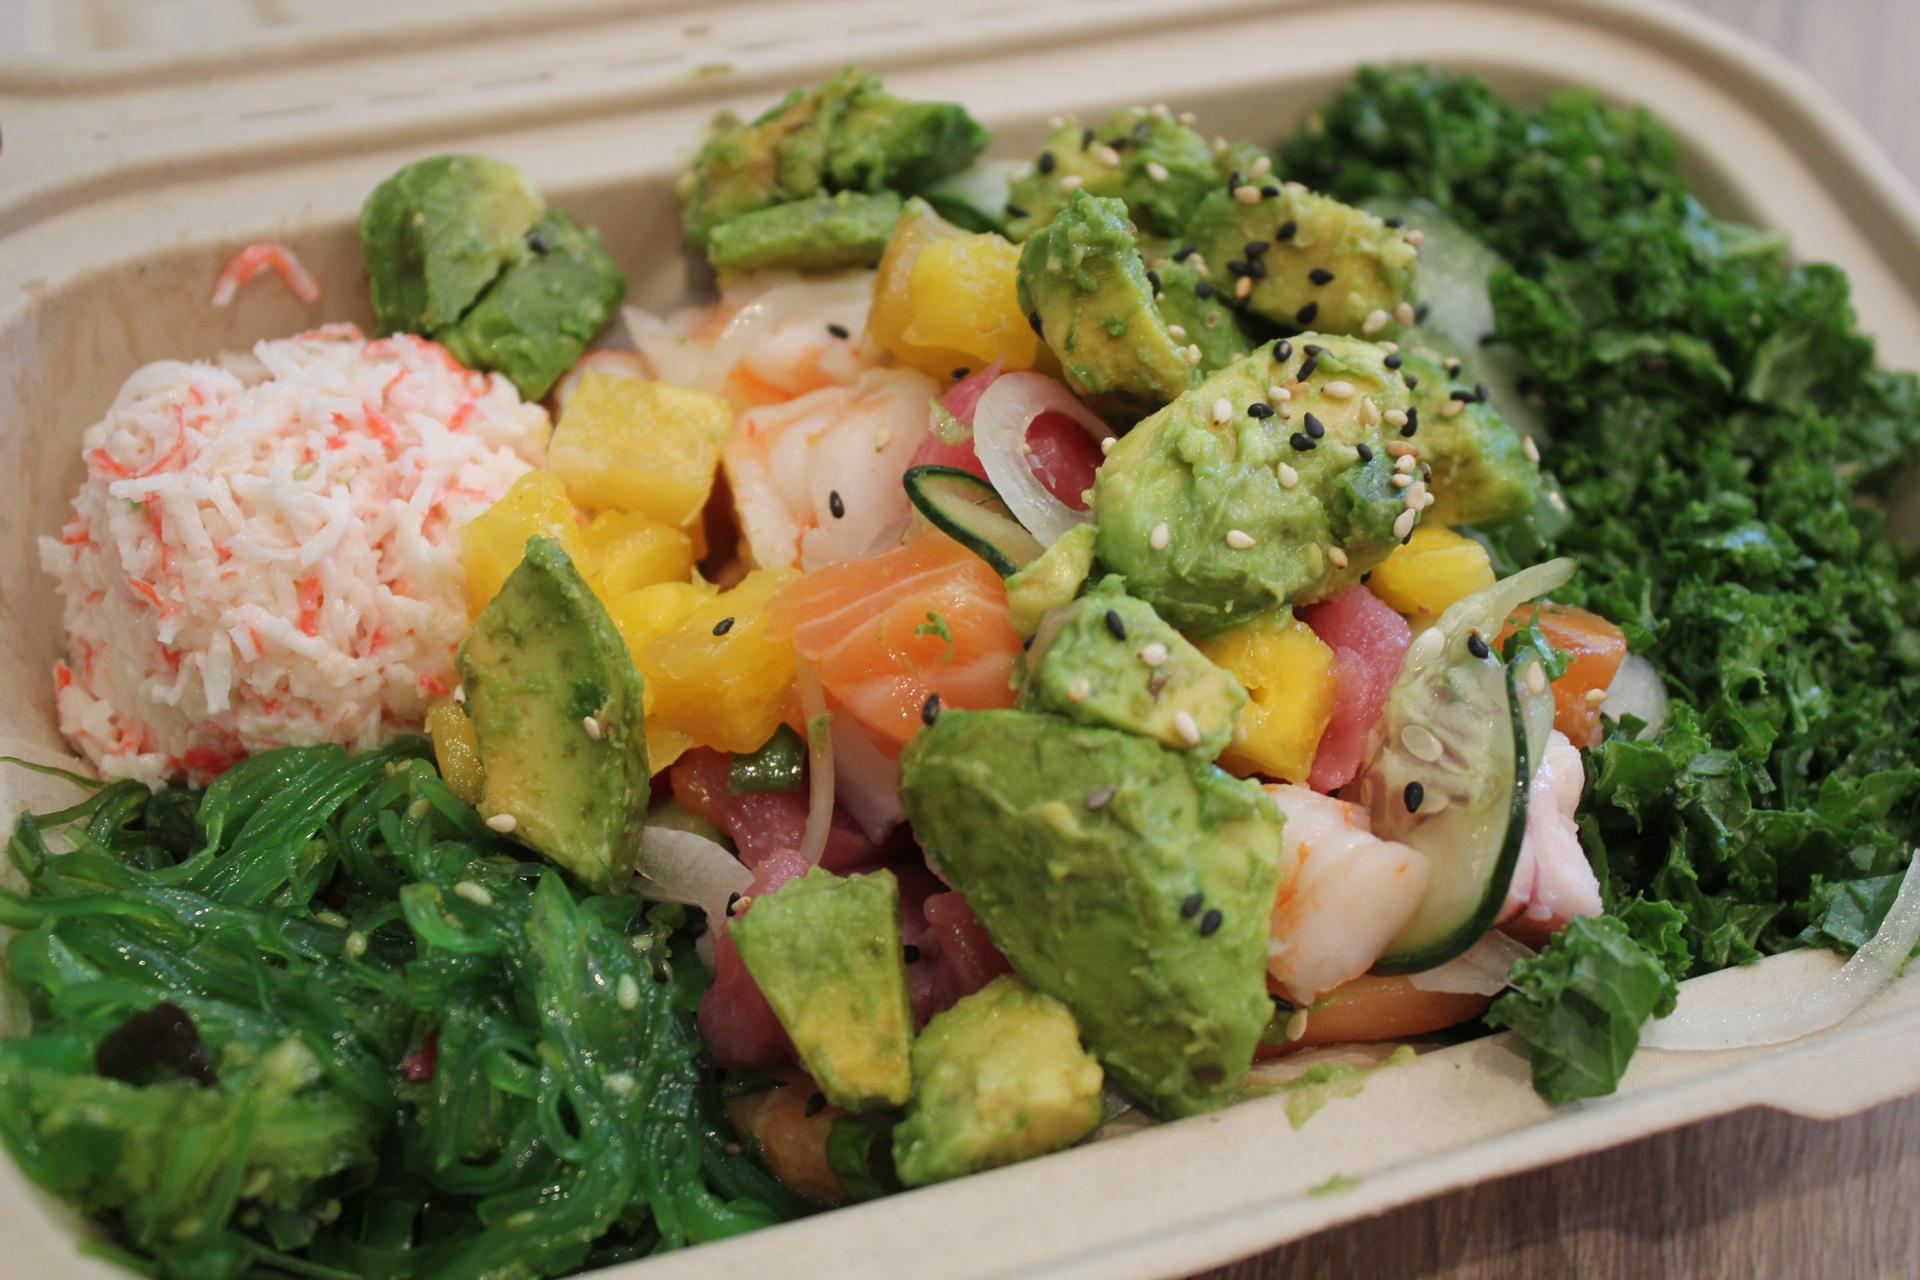 Salmon, ahi tuna and shrimp with mangos over a kale salad.